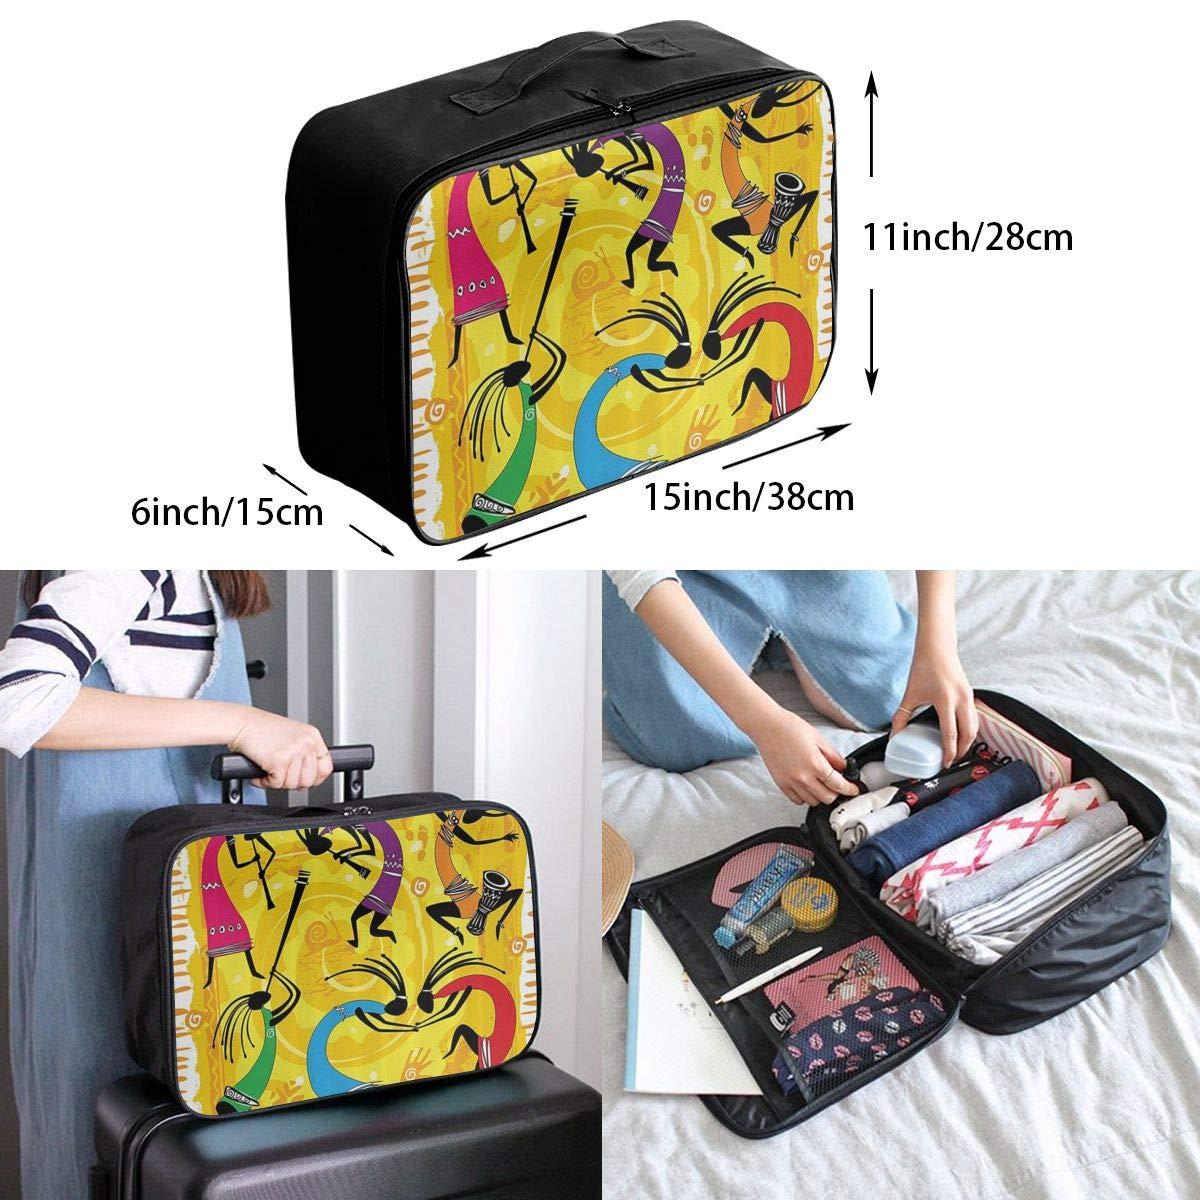 Southwestern Tribal Kokopelli Travel Lightweight Waterproof Folding Storage Carry Luggage Duffle Tote Bag Large Capacity In Trolley Handle Bags 6x11x15 Inch